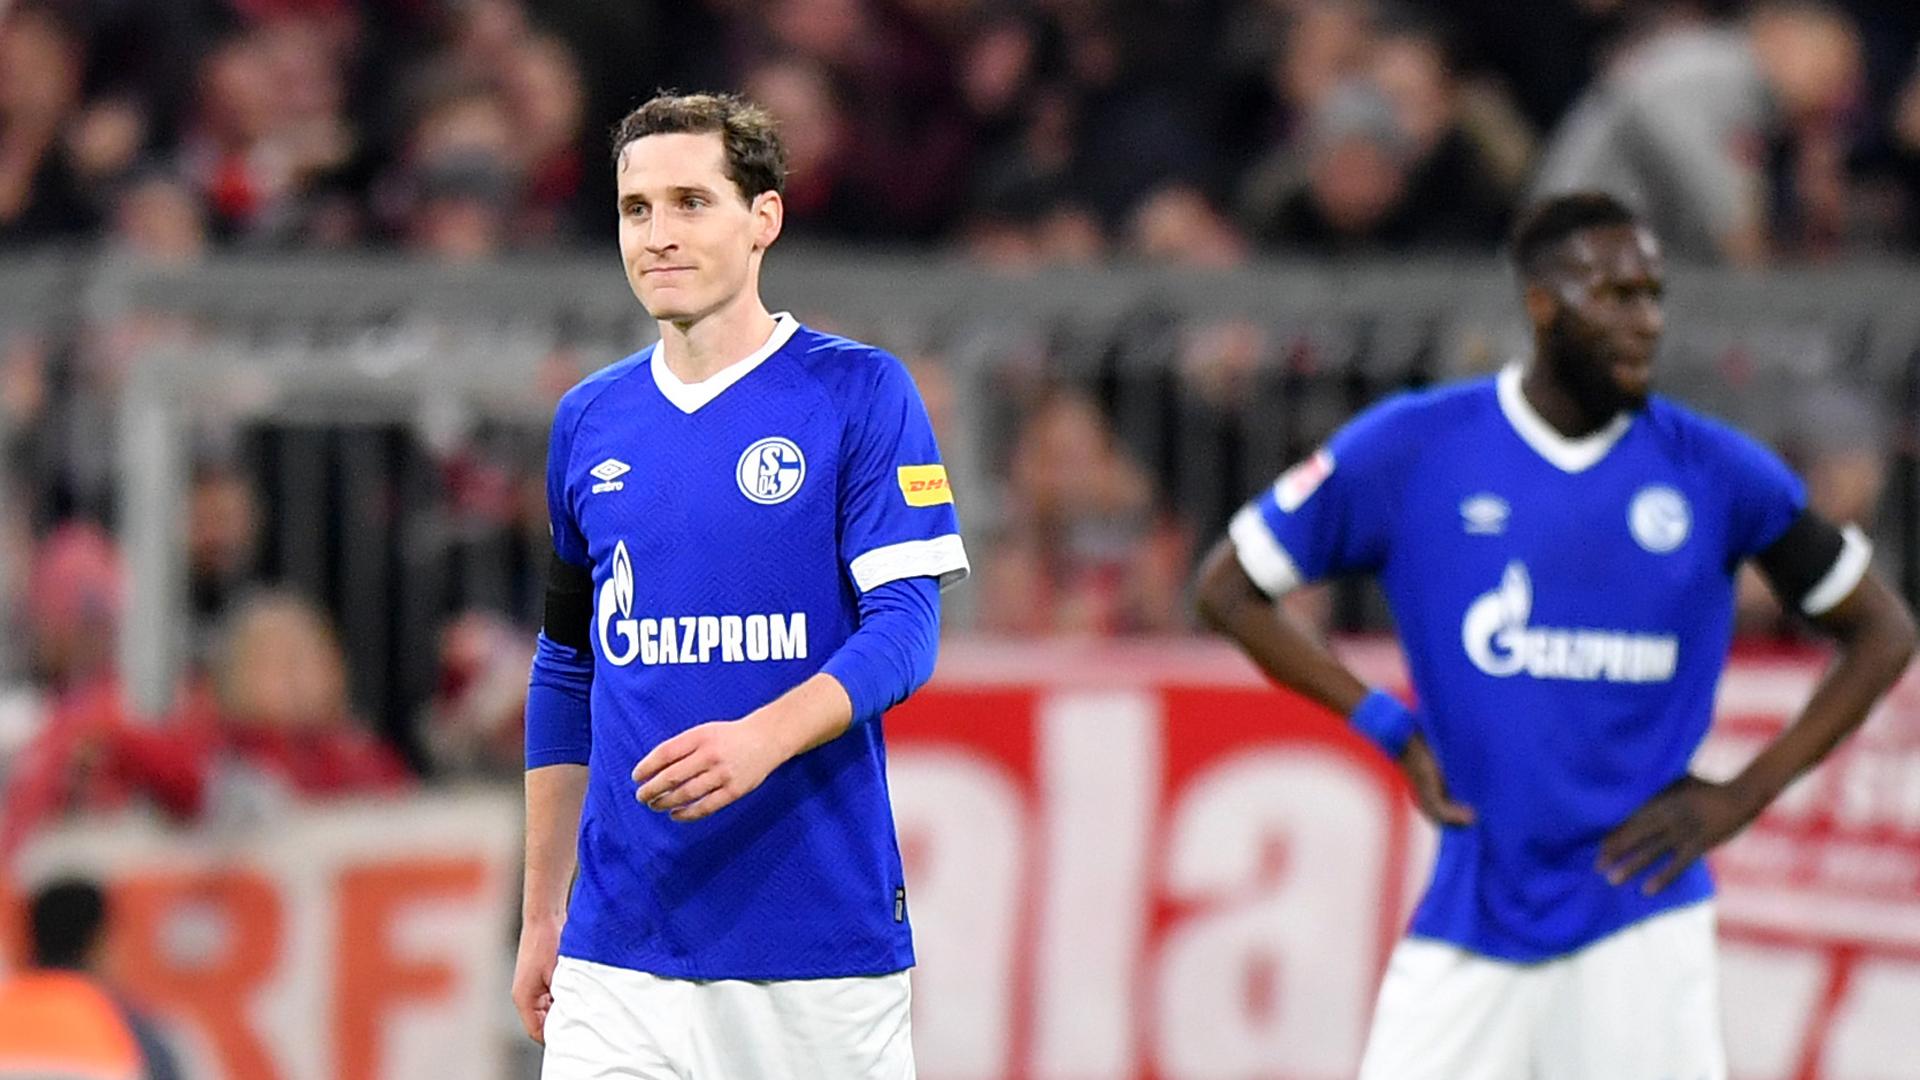 Sebastian Rudy Schalke 09022019